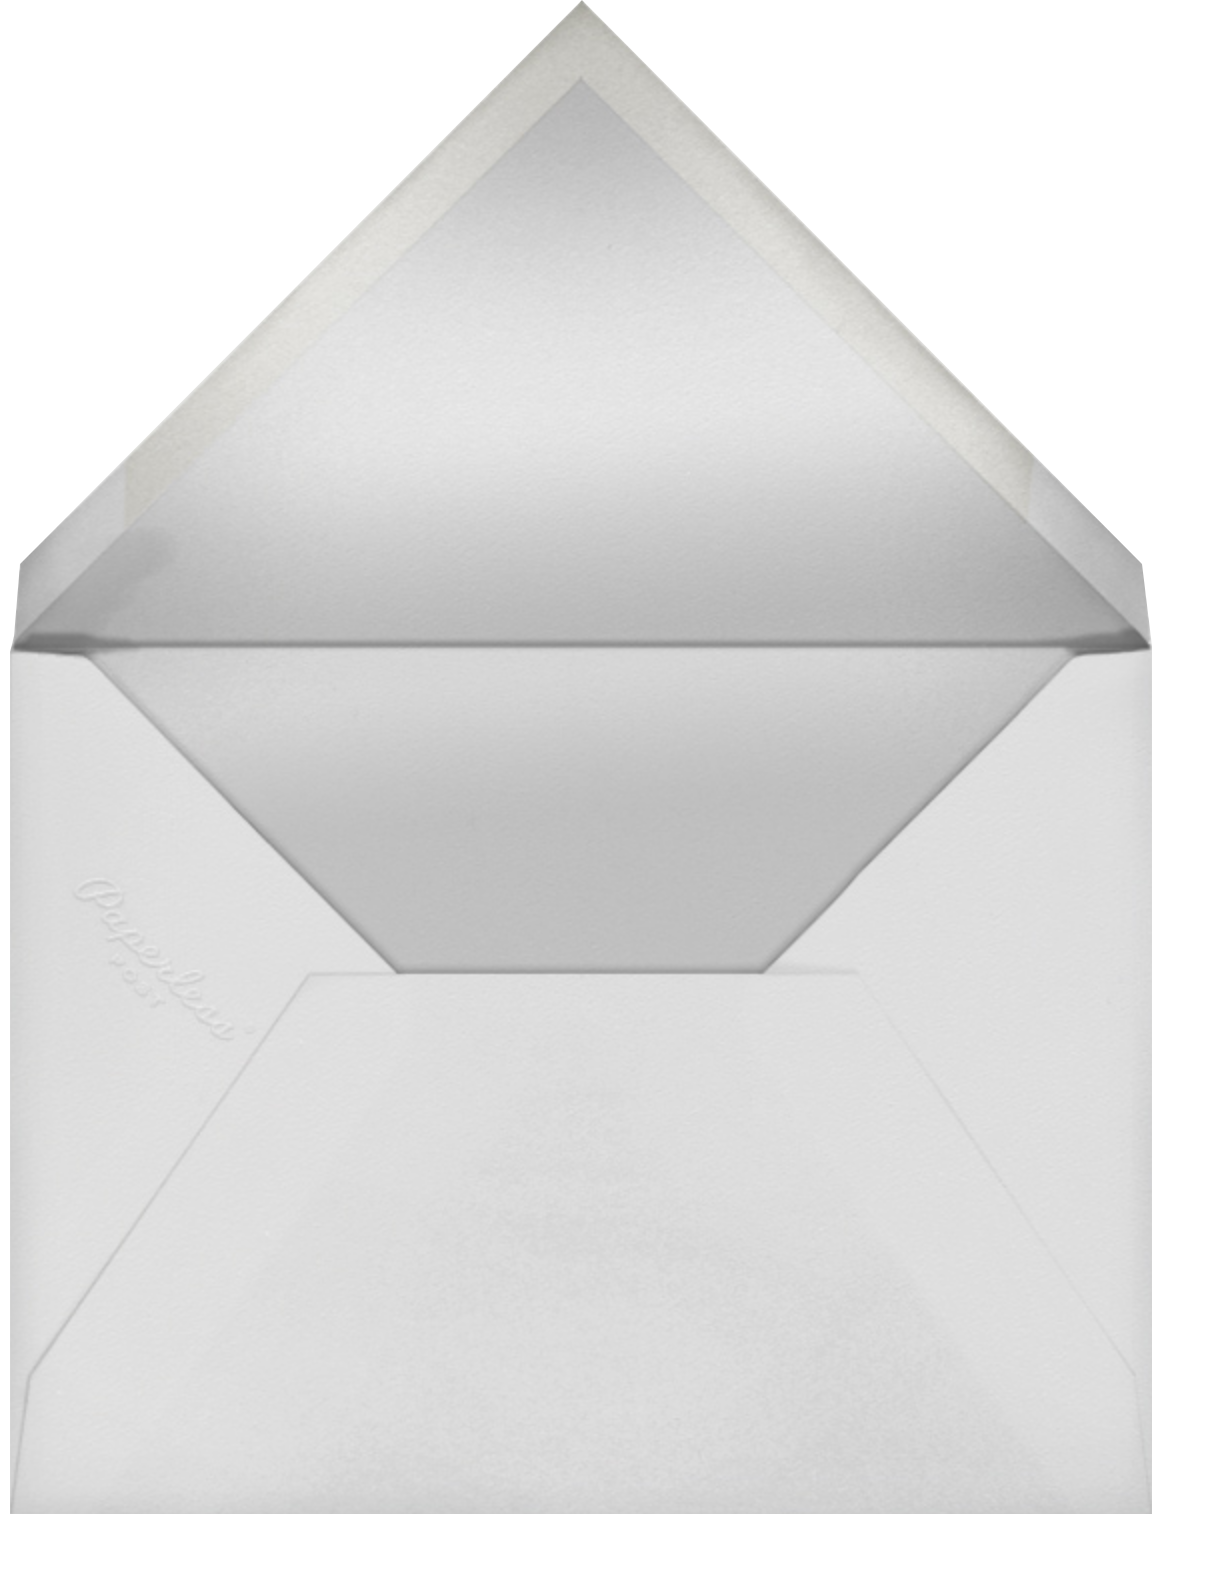 Pop Carnation (Menu) - Oscar de la Renta - Menus - envelope back